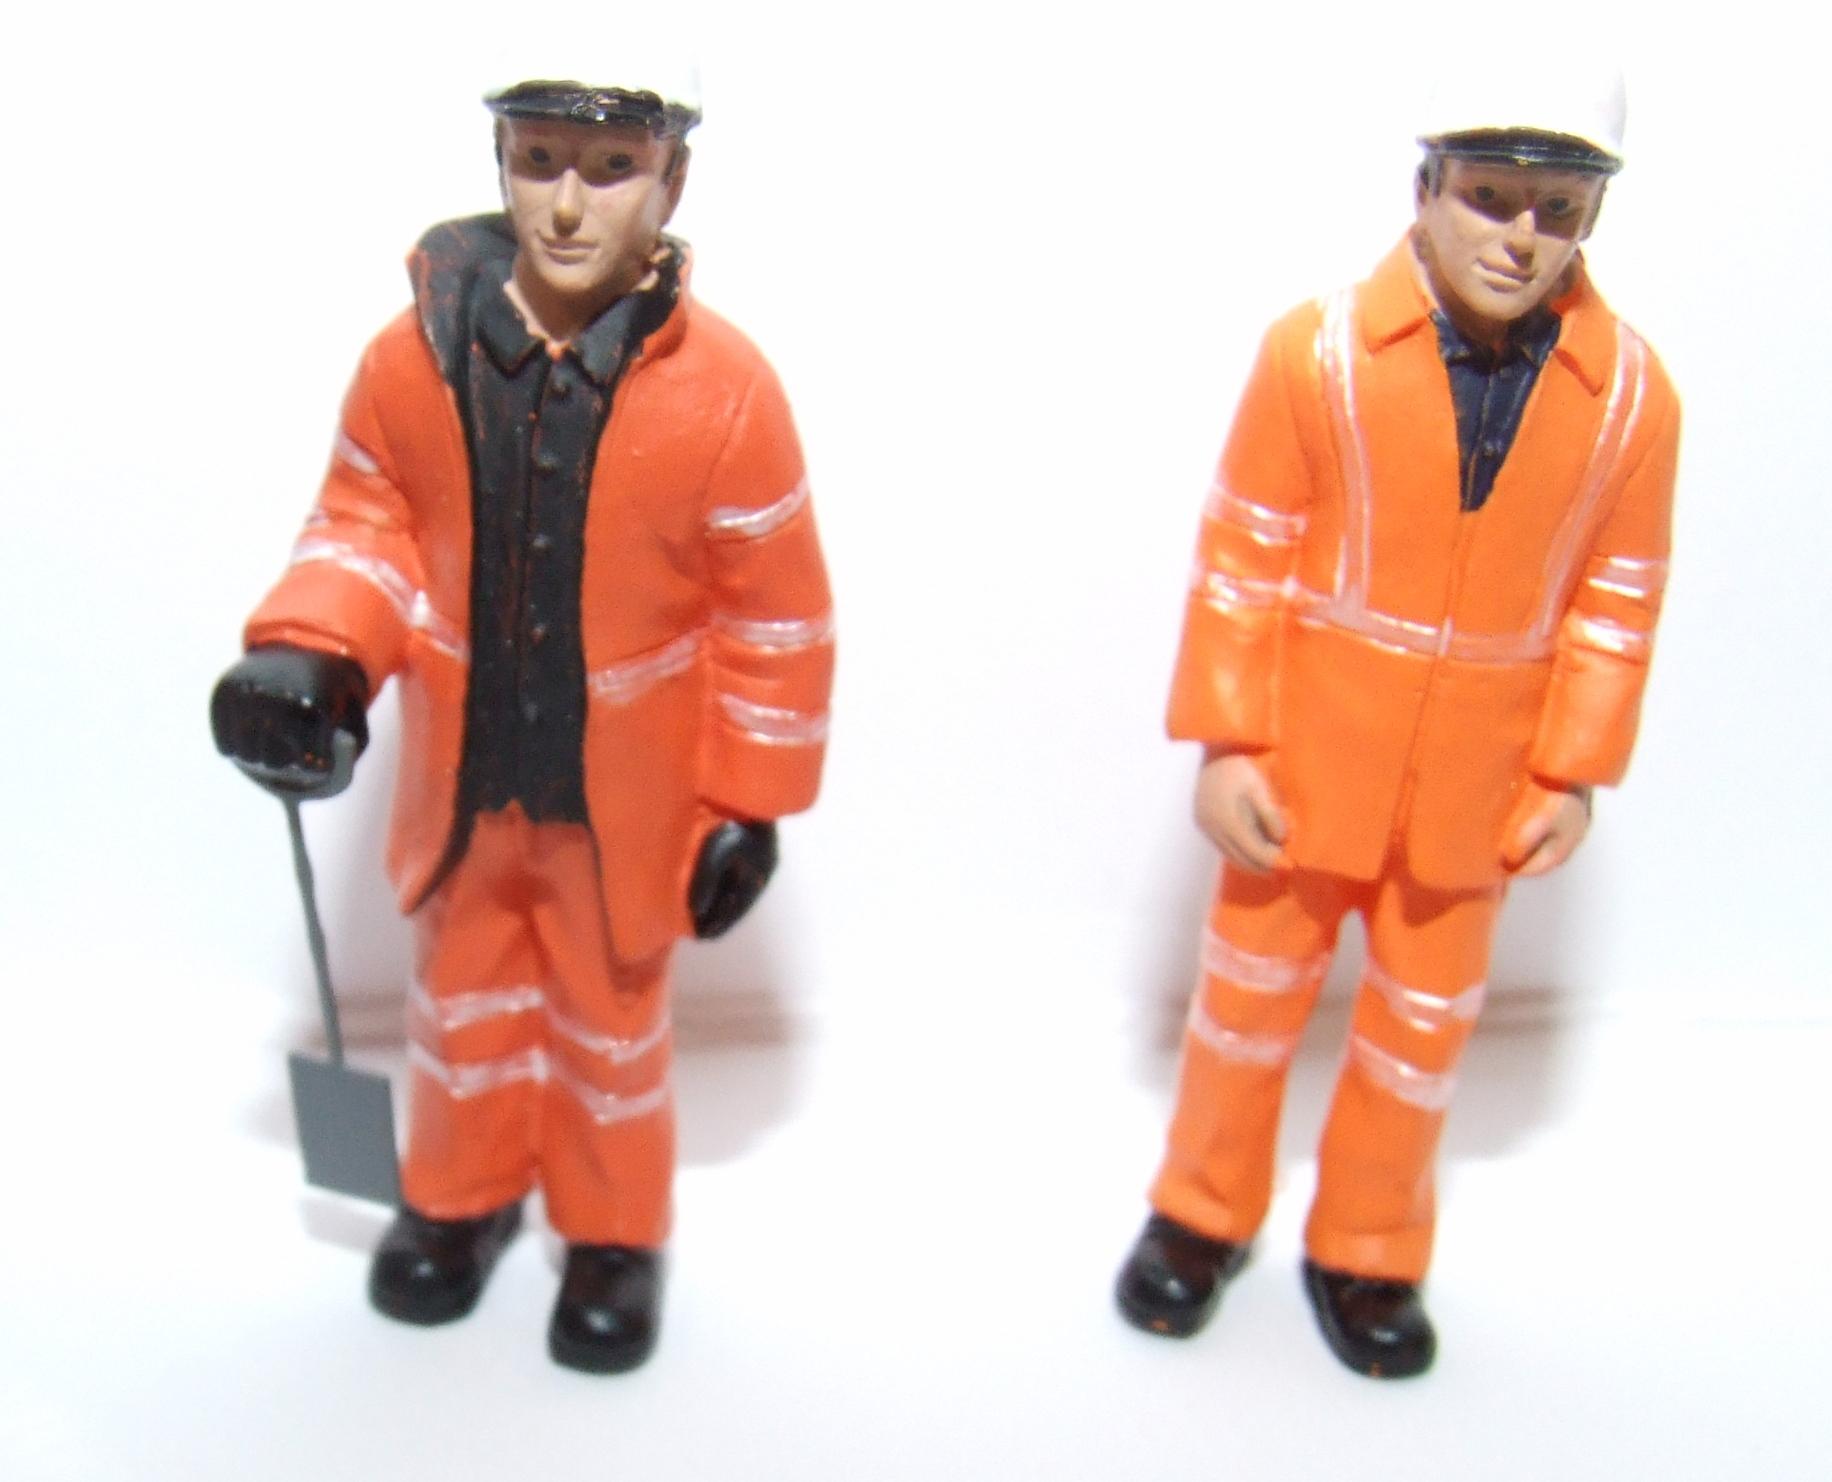 Scenecraft 47-402 Spur 0 1:43 Figuren Arbeiter